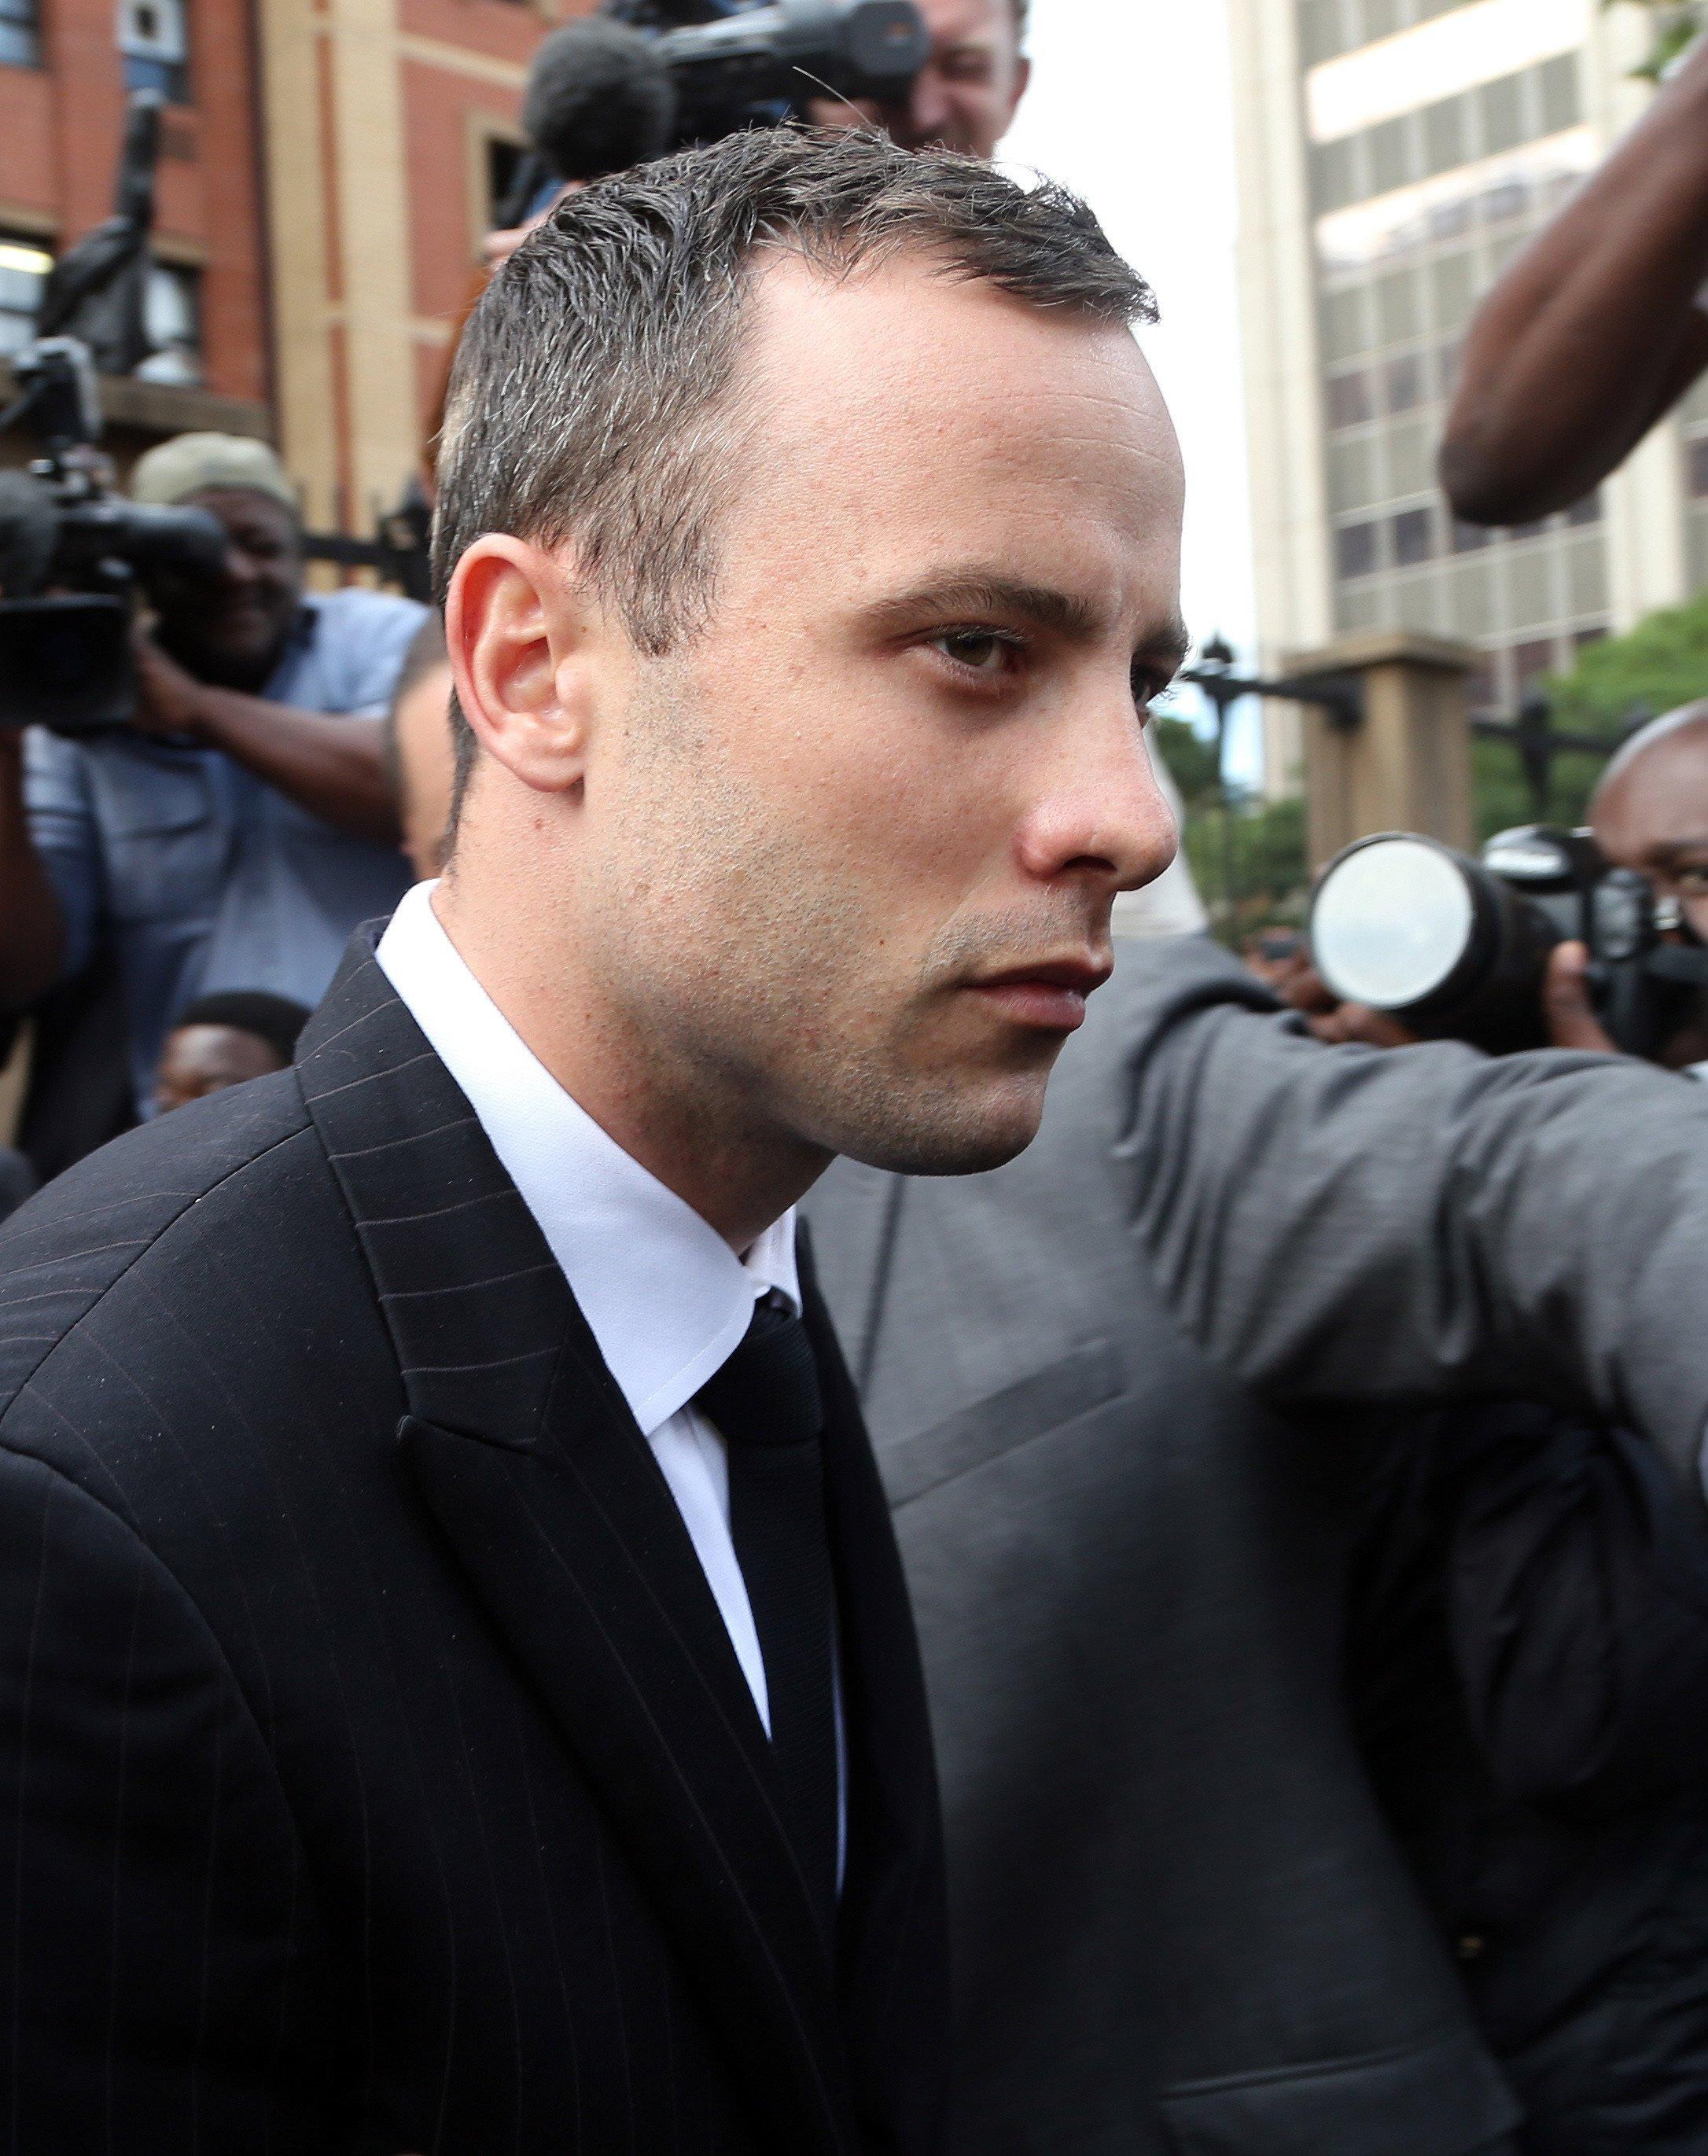 Image: Oscar Pistorius on Wednesday